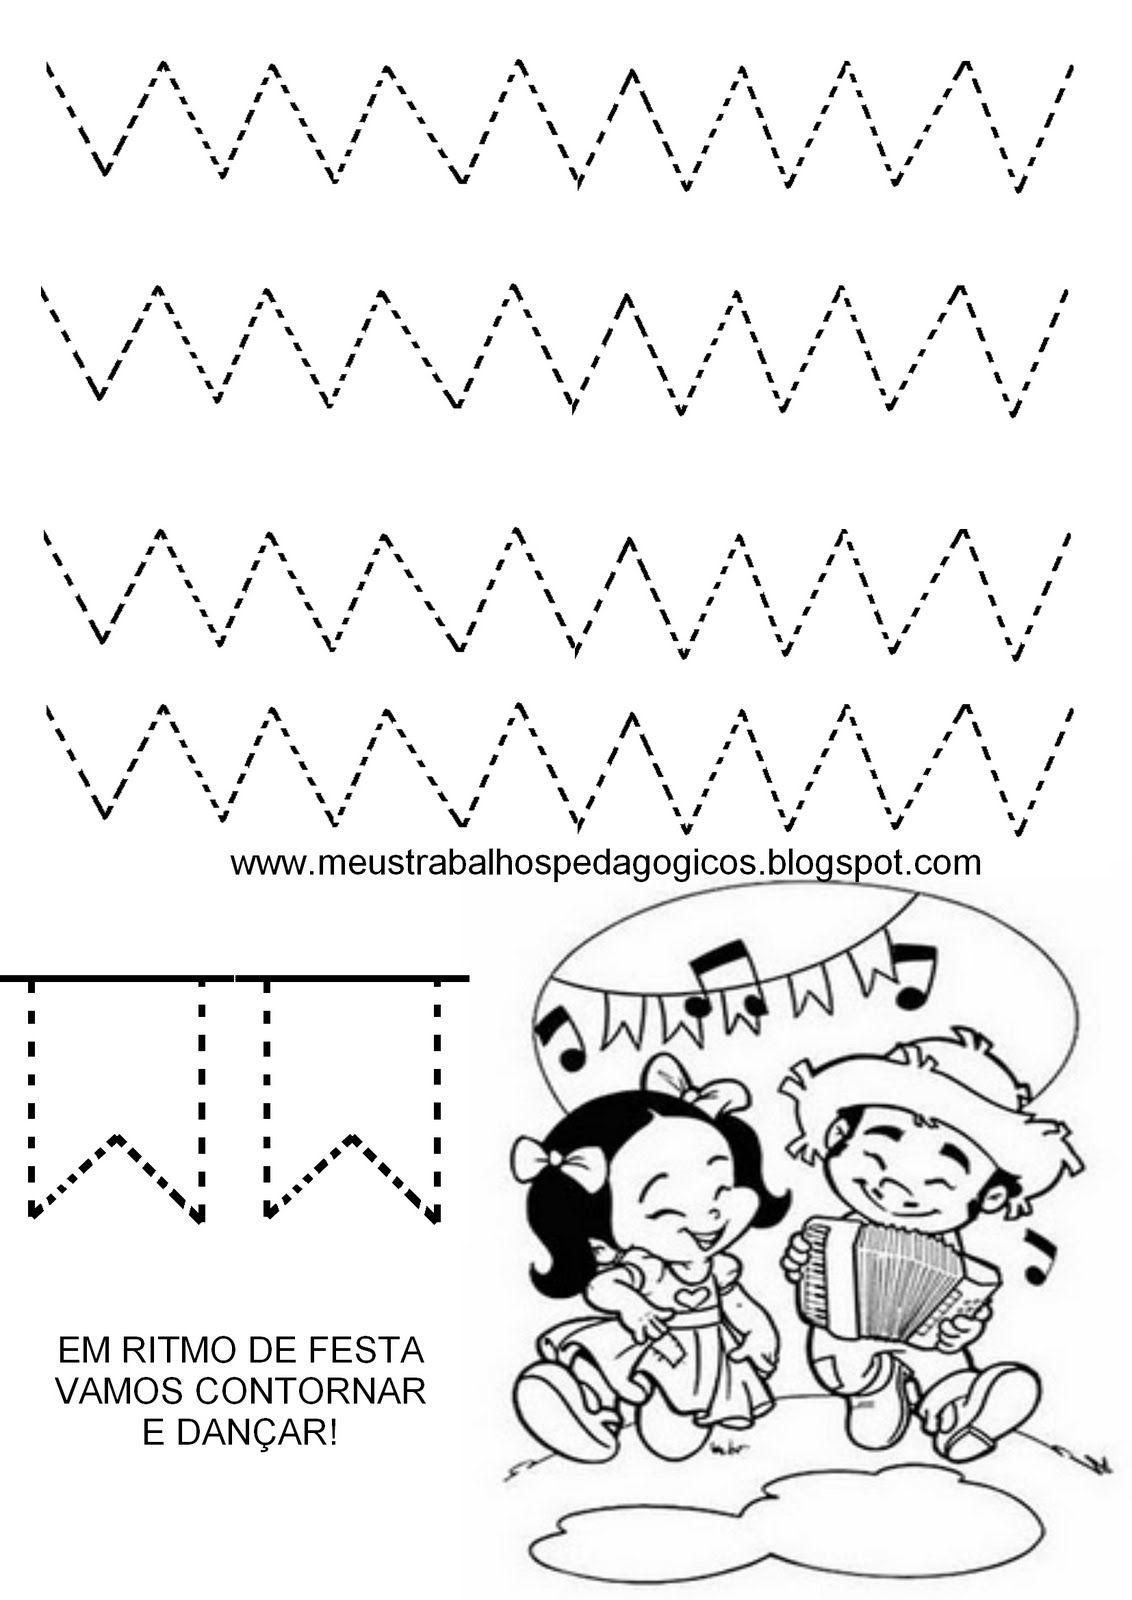 Sao joao grafisme pinterest handwriting and school